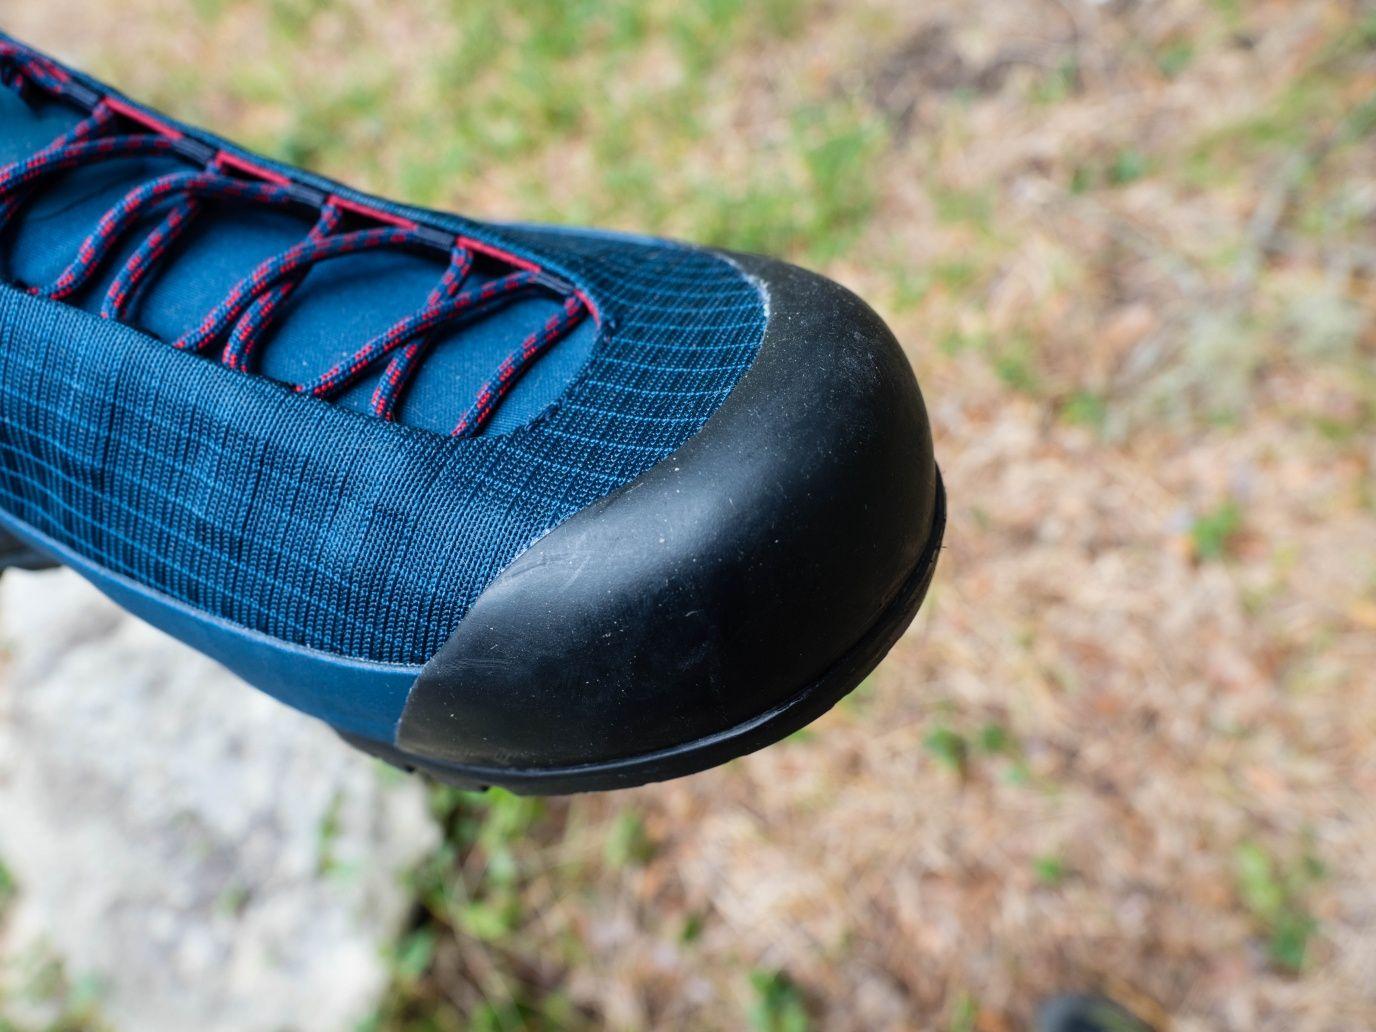 49bdb73cba6 First Look: Arc'teryx Konseal FL Approach Shoe Review | Вішліст ...